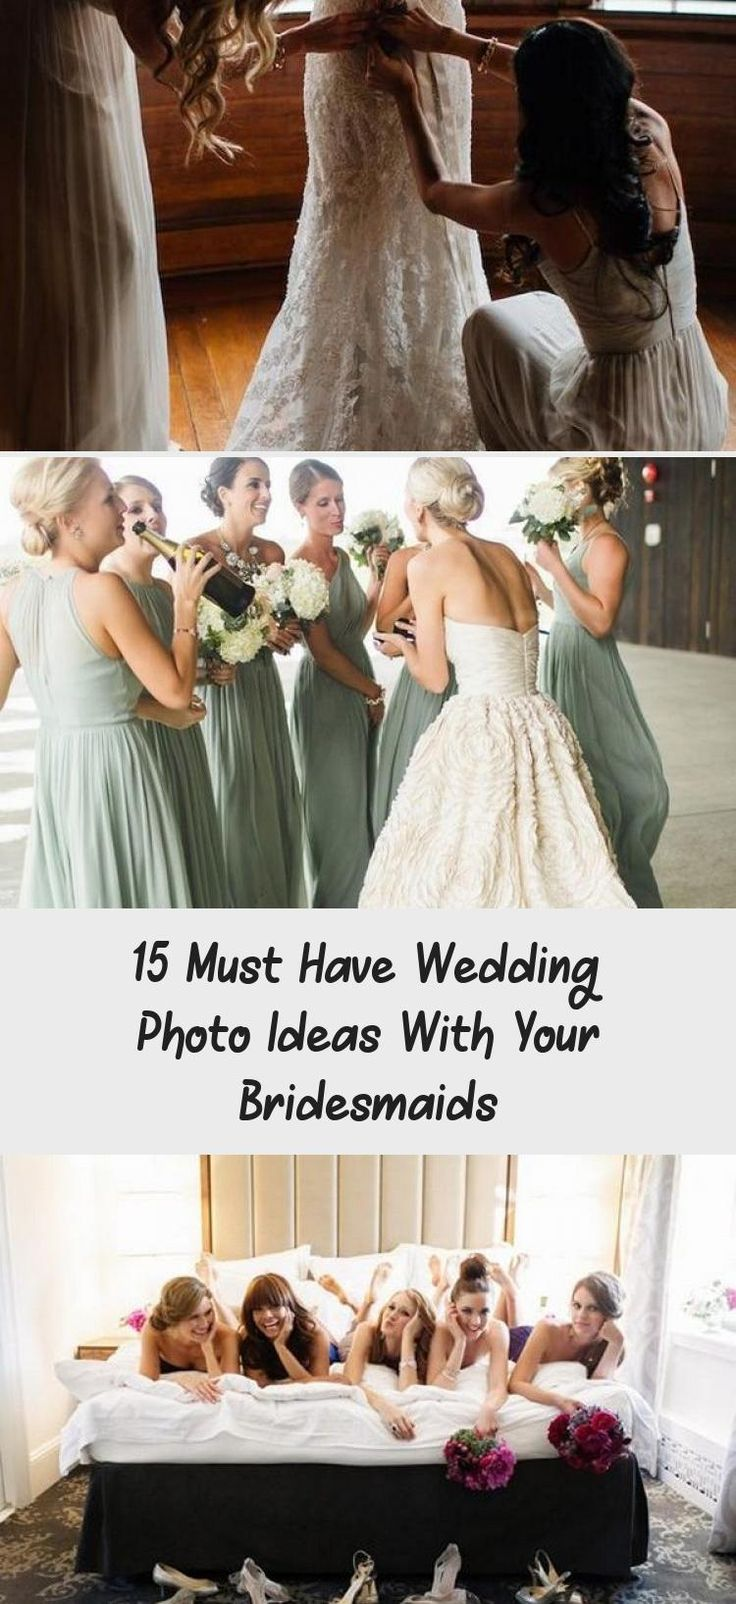 neutral colored bridesmaid dresses #SilverBridesmaidDresses #OffTheShoulderBridesmaidDresses #BridesmaidDressesVintage #BlushBridesmaidDresses #BridesmaidDressesPastel